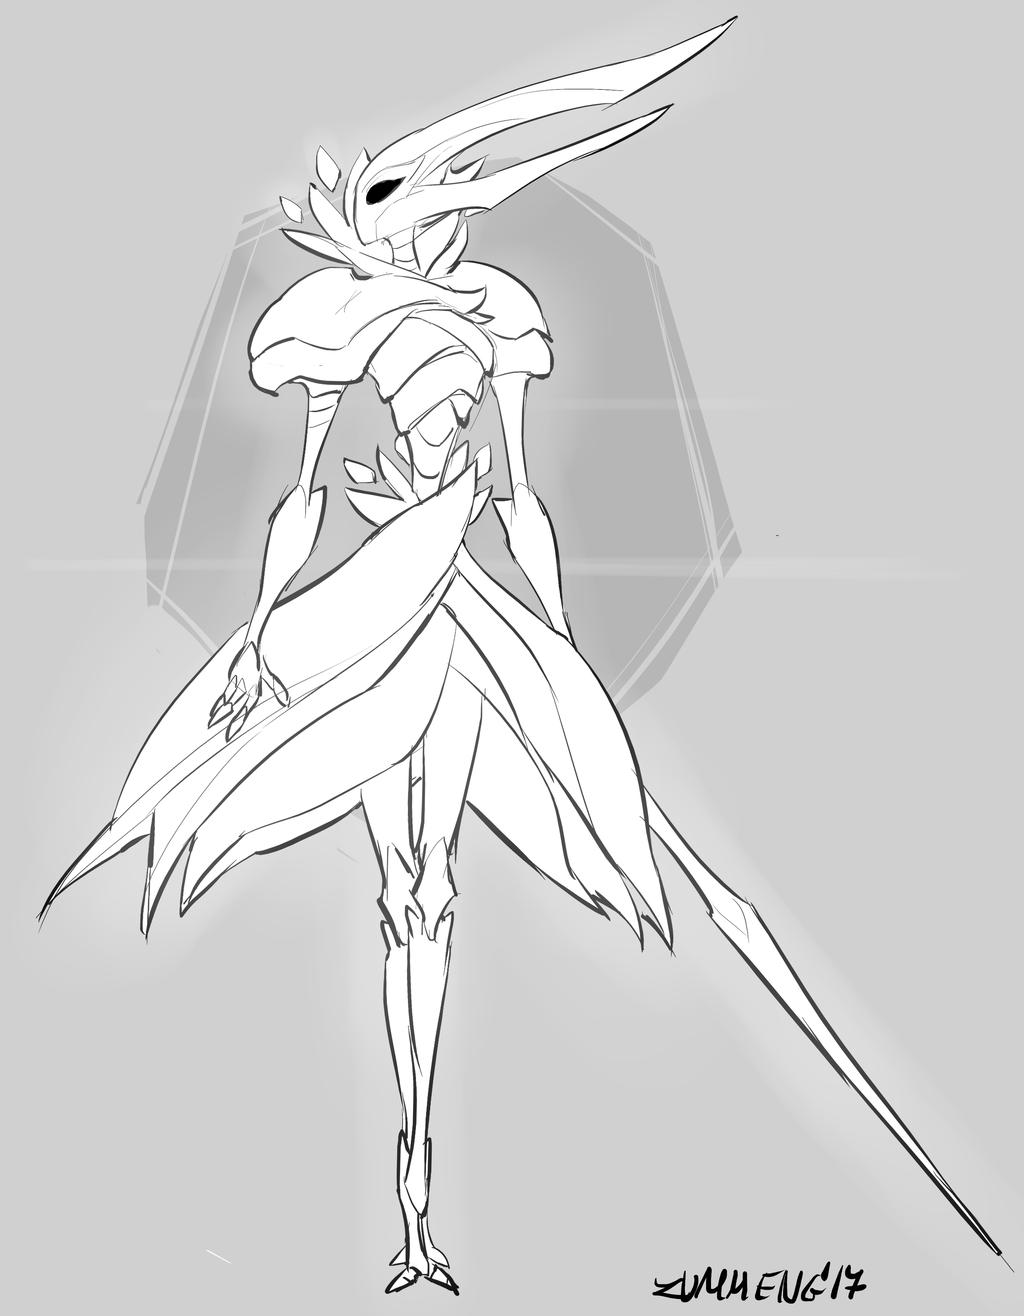 Dryya - Hollow Knight Fanart